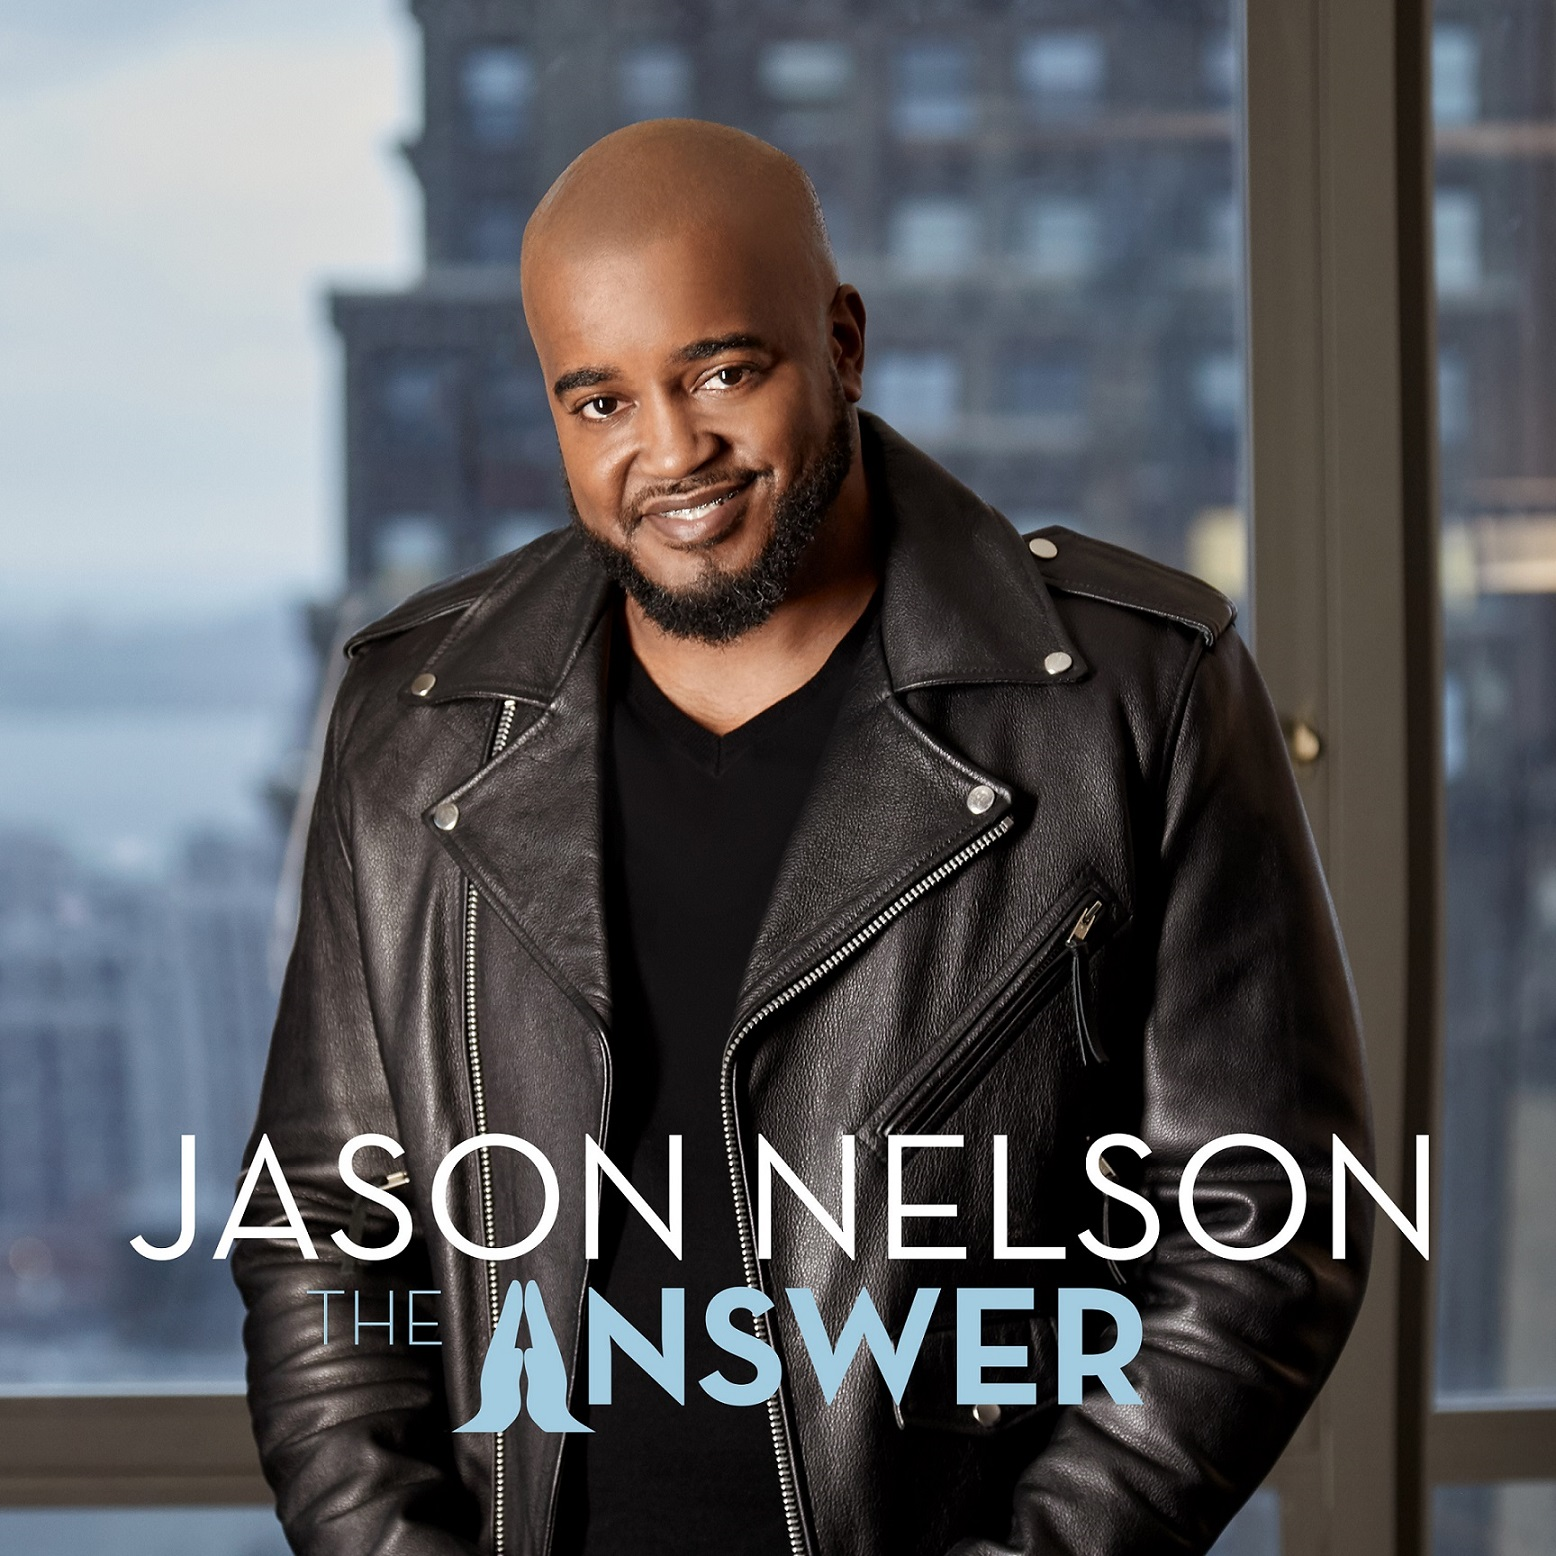 JasonNelson_TheAnswer_album cover